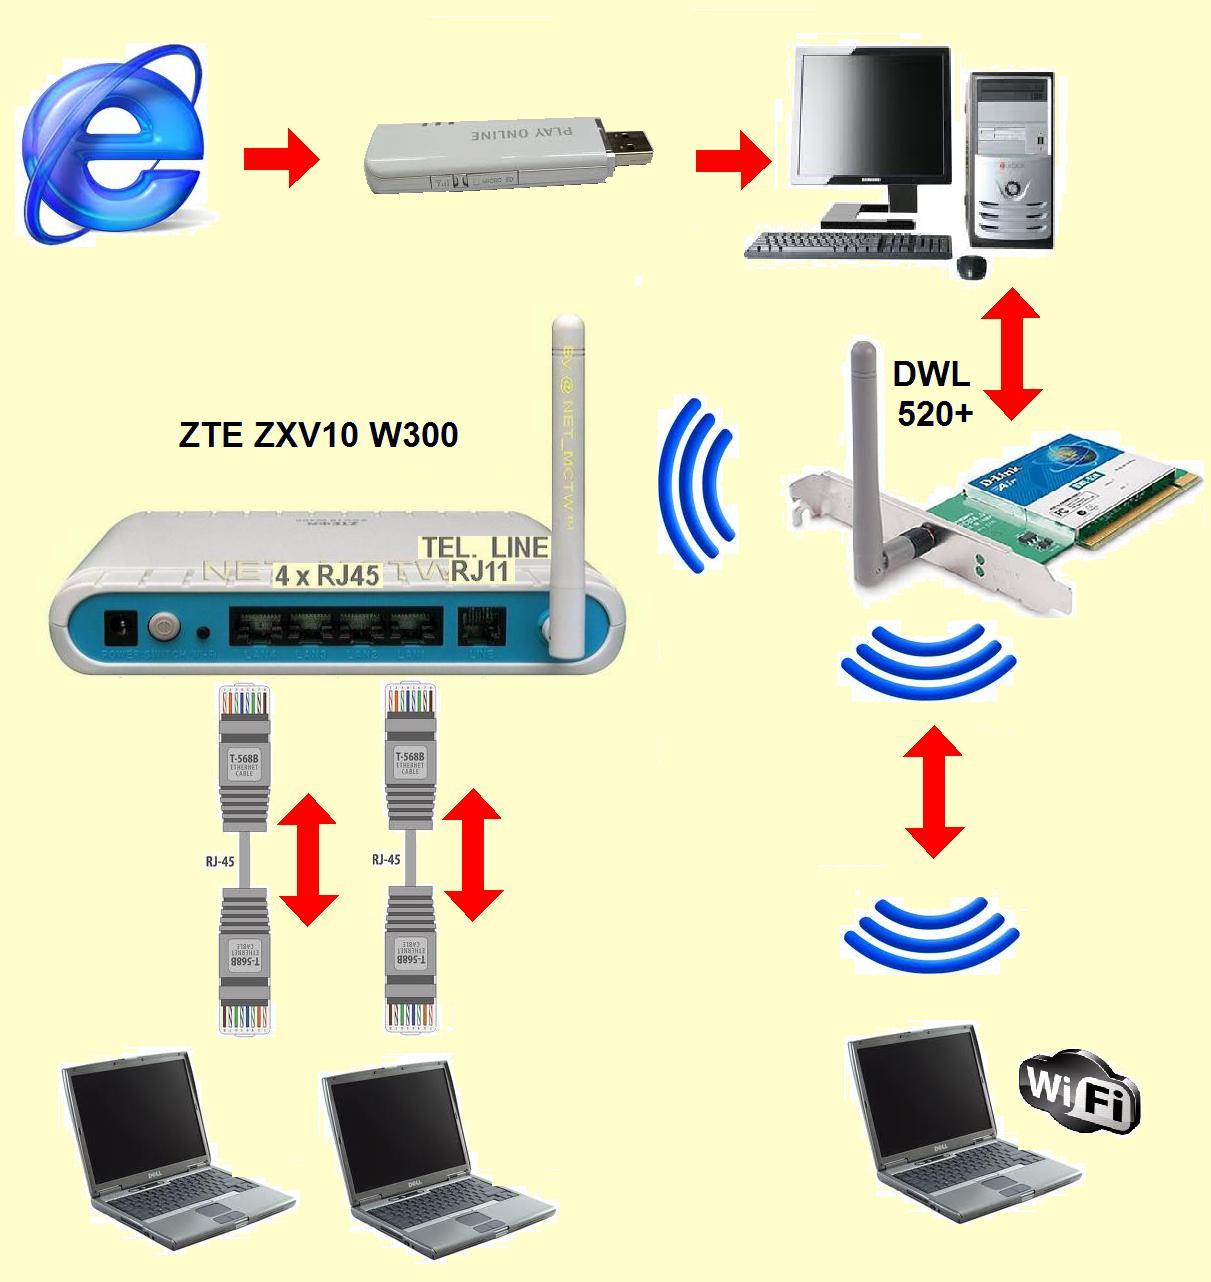 Sie� komputerowa D-Link DWL 520+, ZTE ZXV10 W300